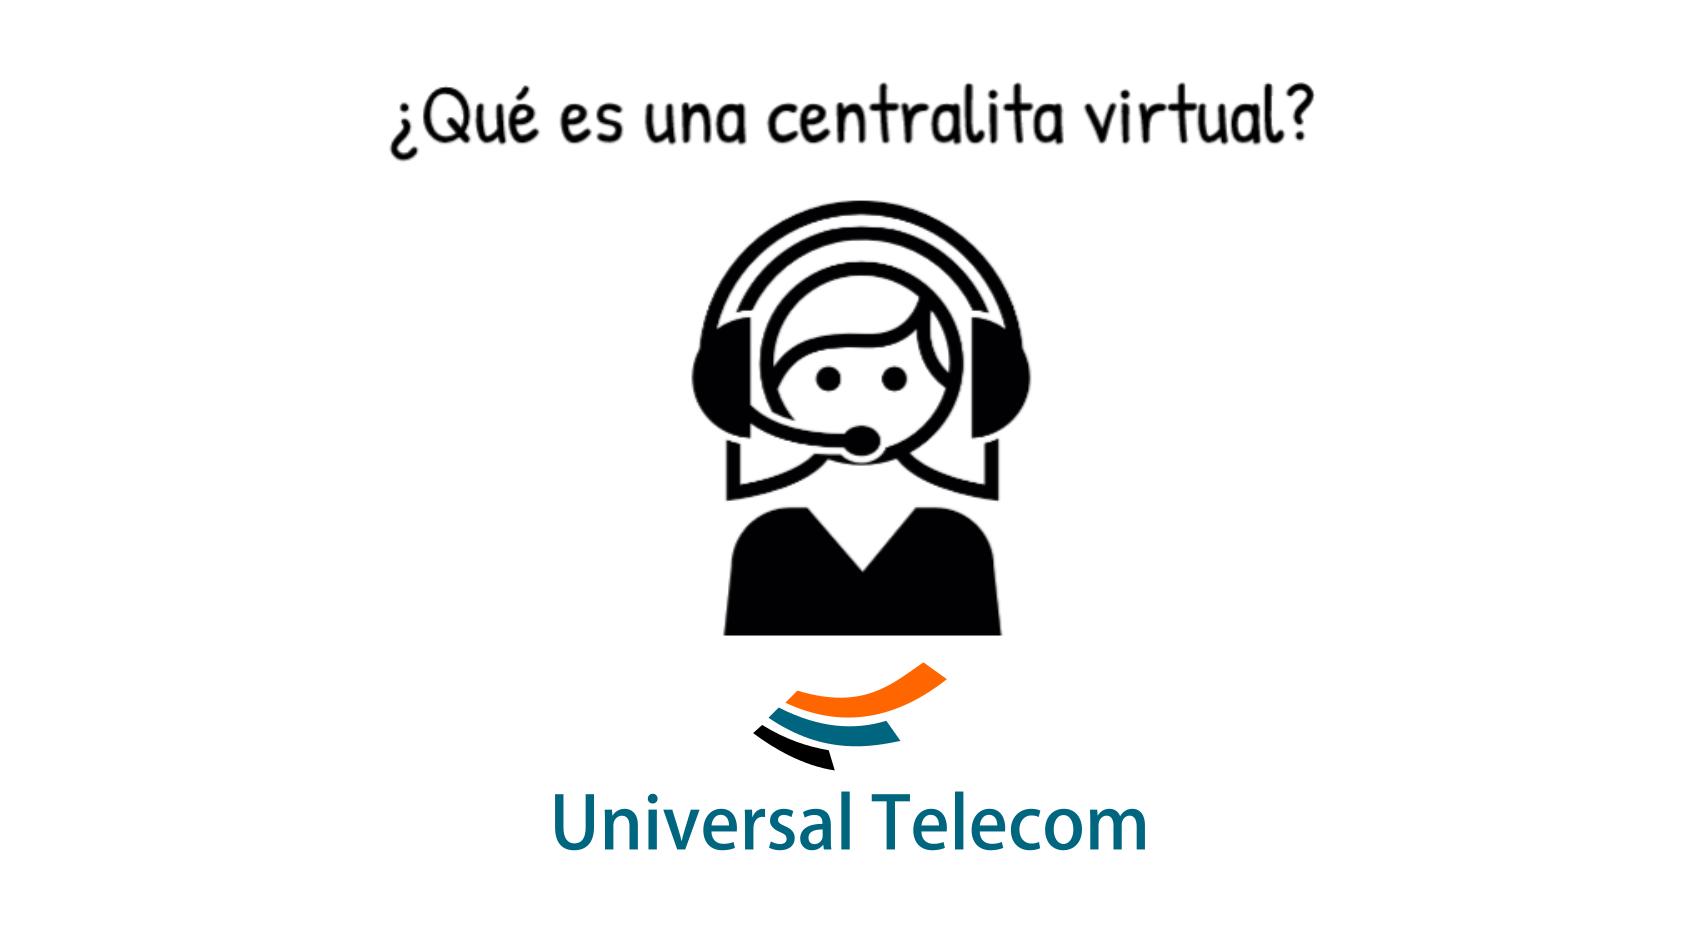 La Centralita Virtual